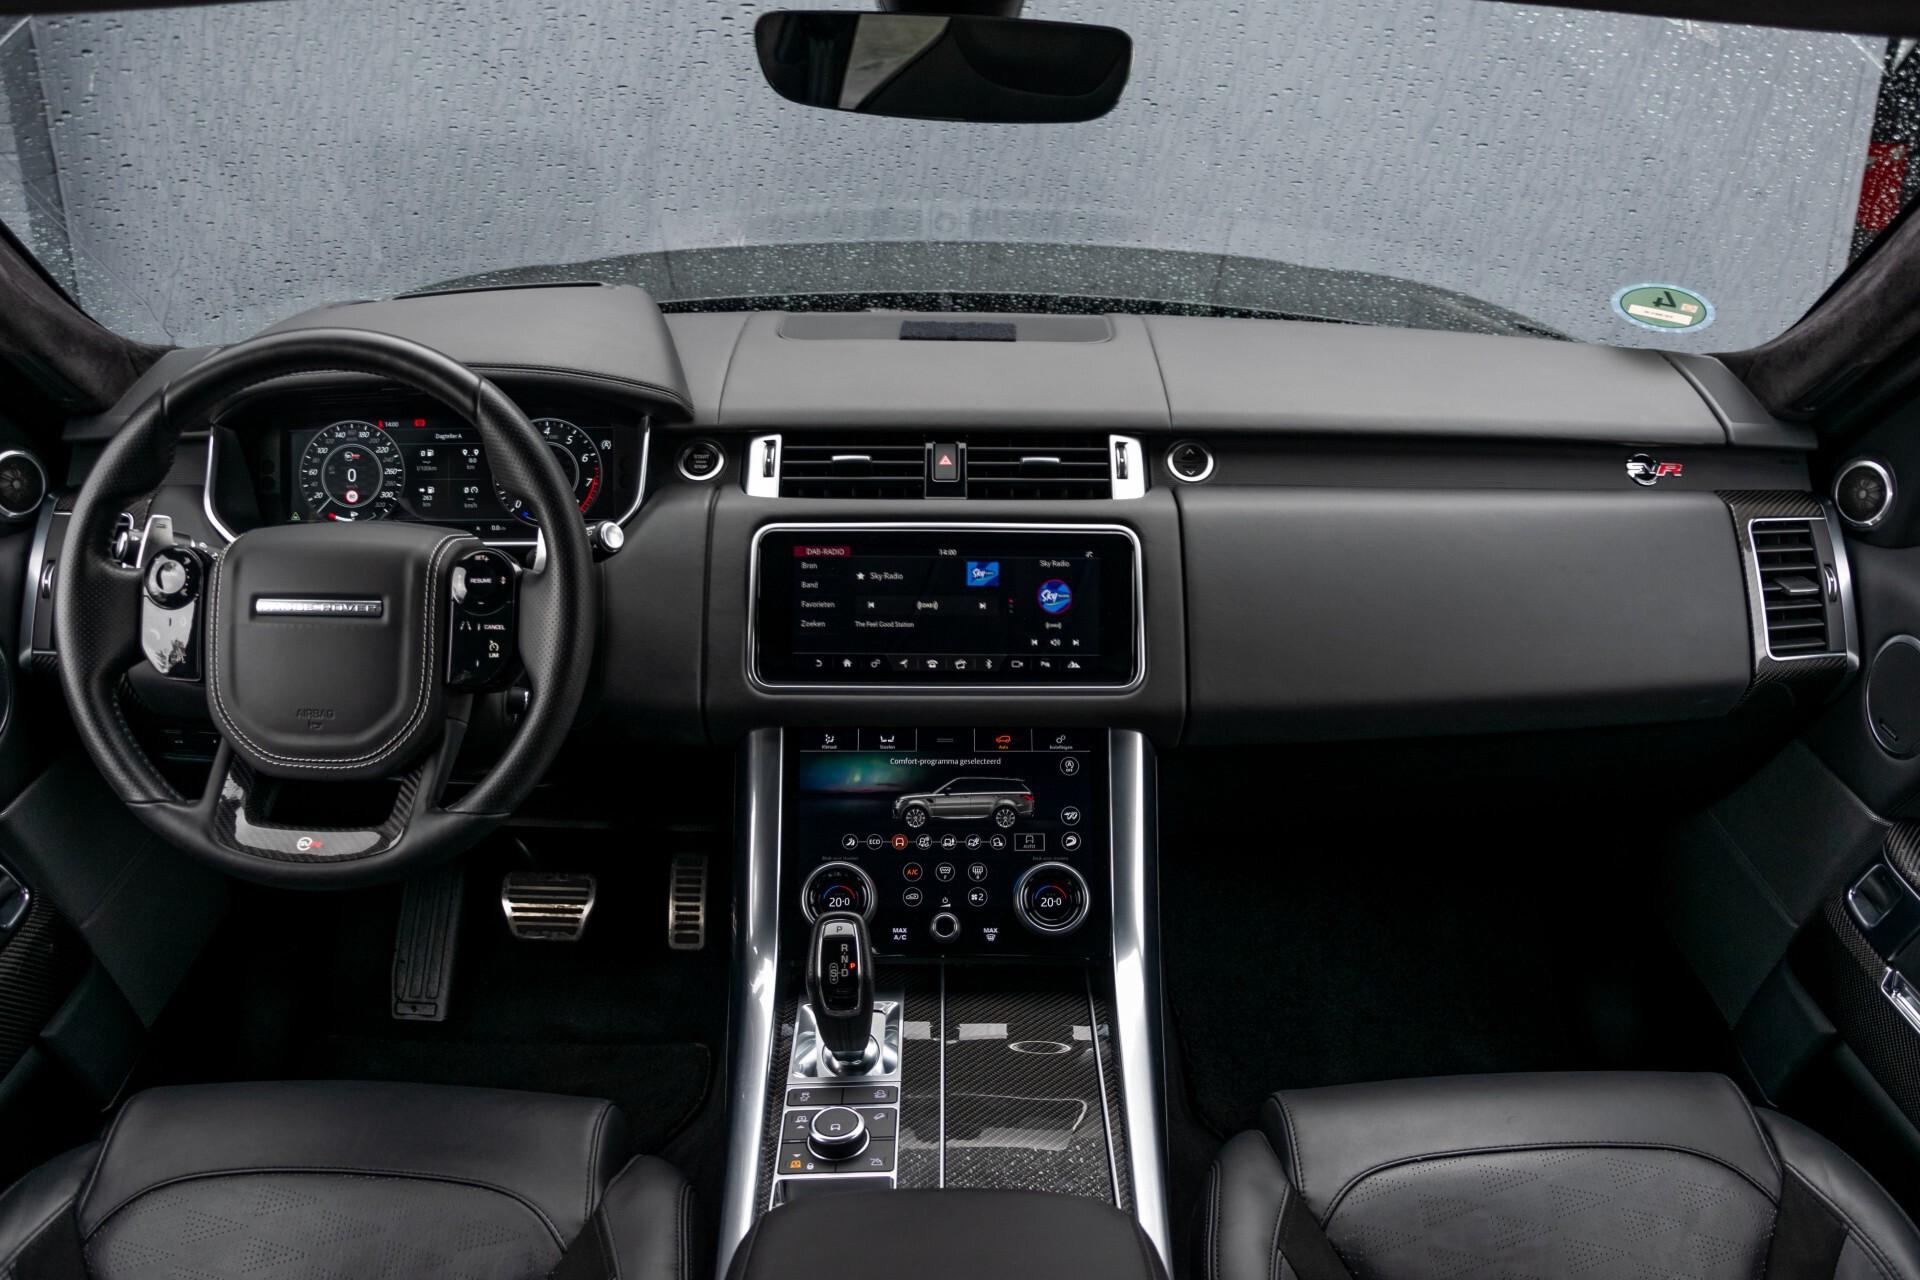 Land Rover Range Rover Sport SVR 5.0 Supercharged 575pk Full Carbon Nieuwprijs €241377 Foto 8